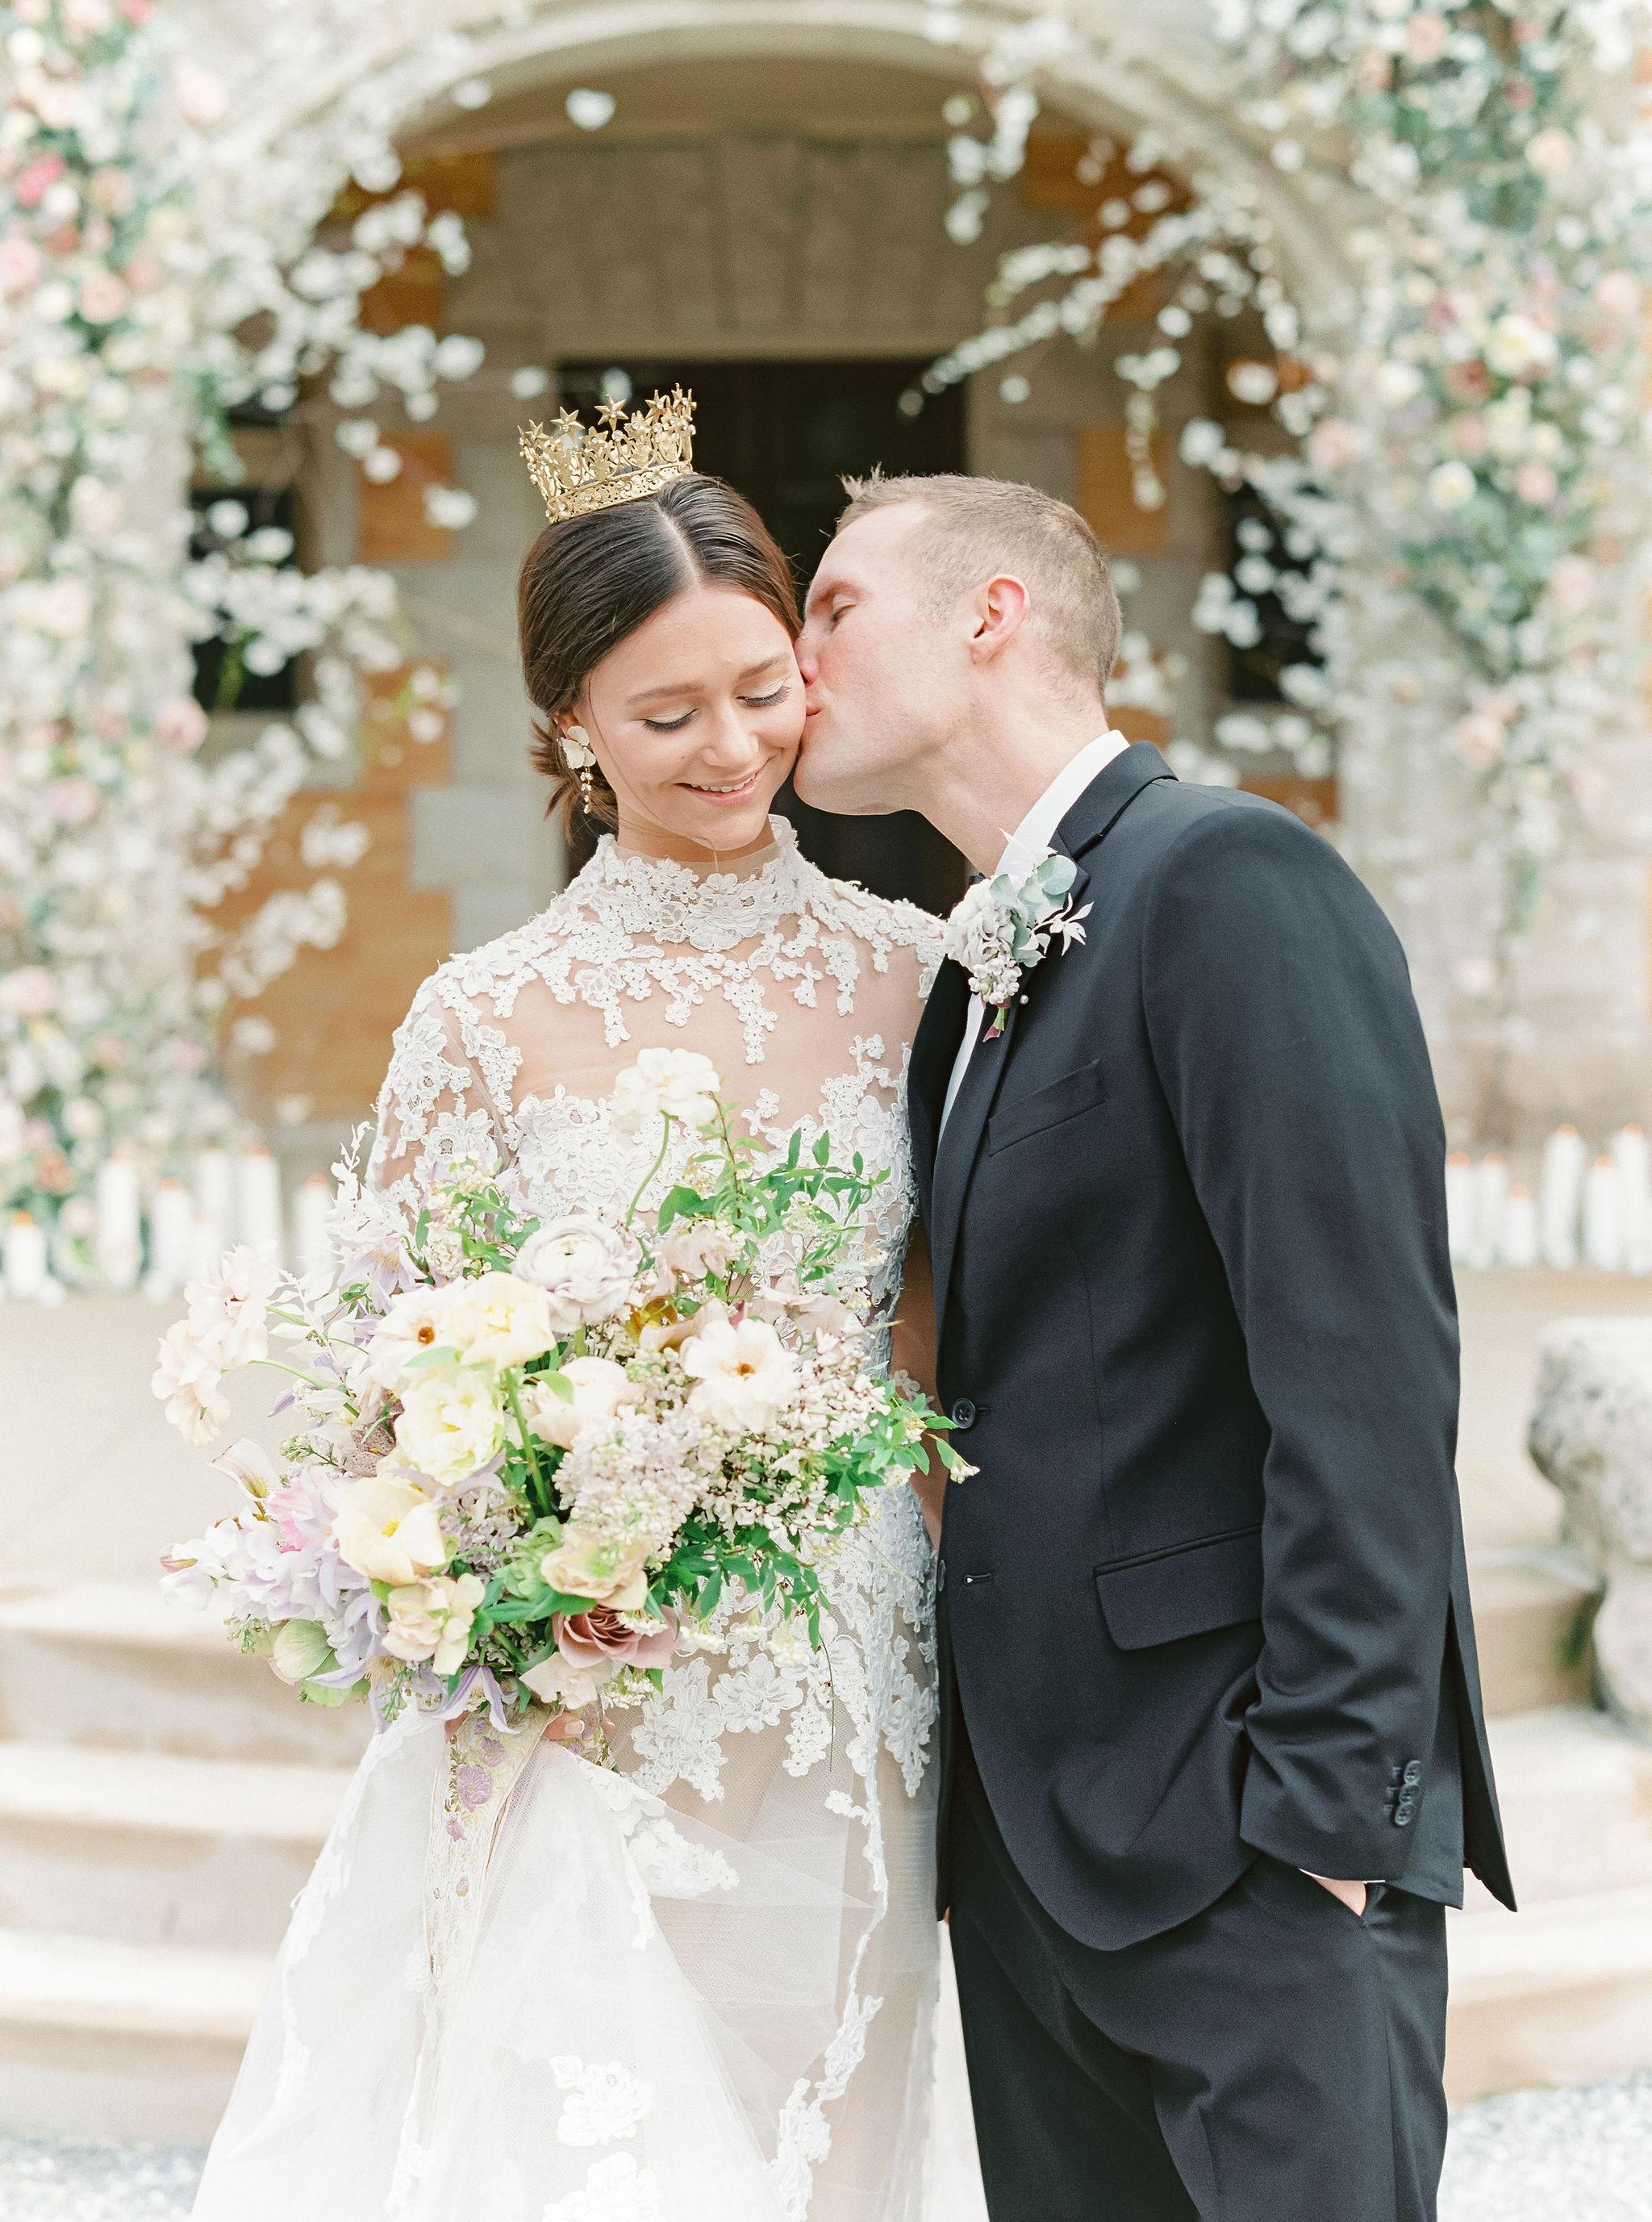 Lauren Fair and East Made Co Wedding Film Photography Workshop at Cairnwood Estate_133.jpg